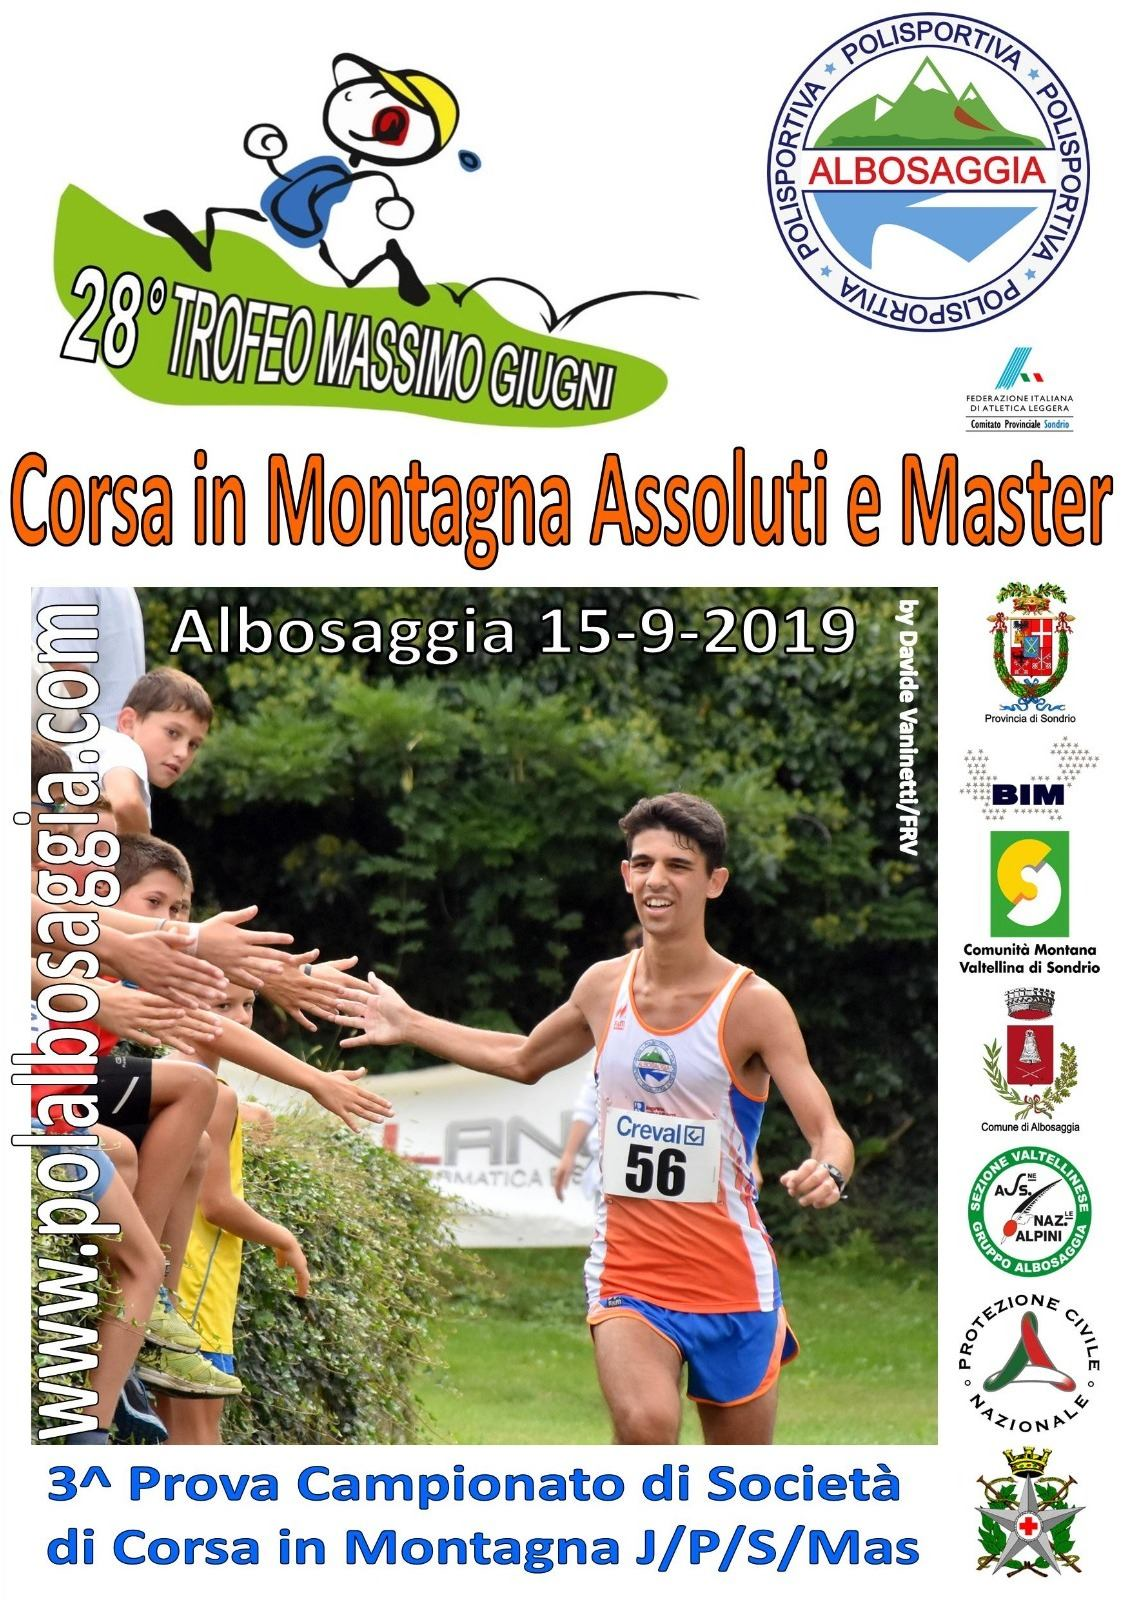 Fidal Lombardia Calendario.28 Trofeo Giugni Fidal Sondrio